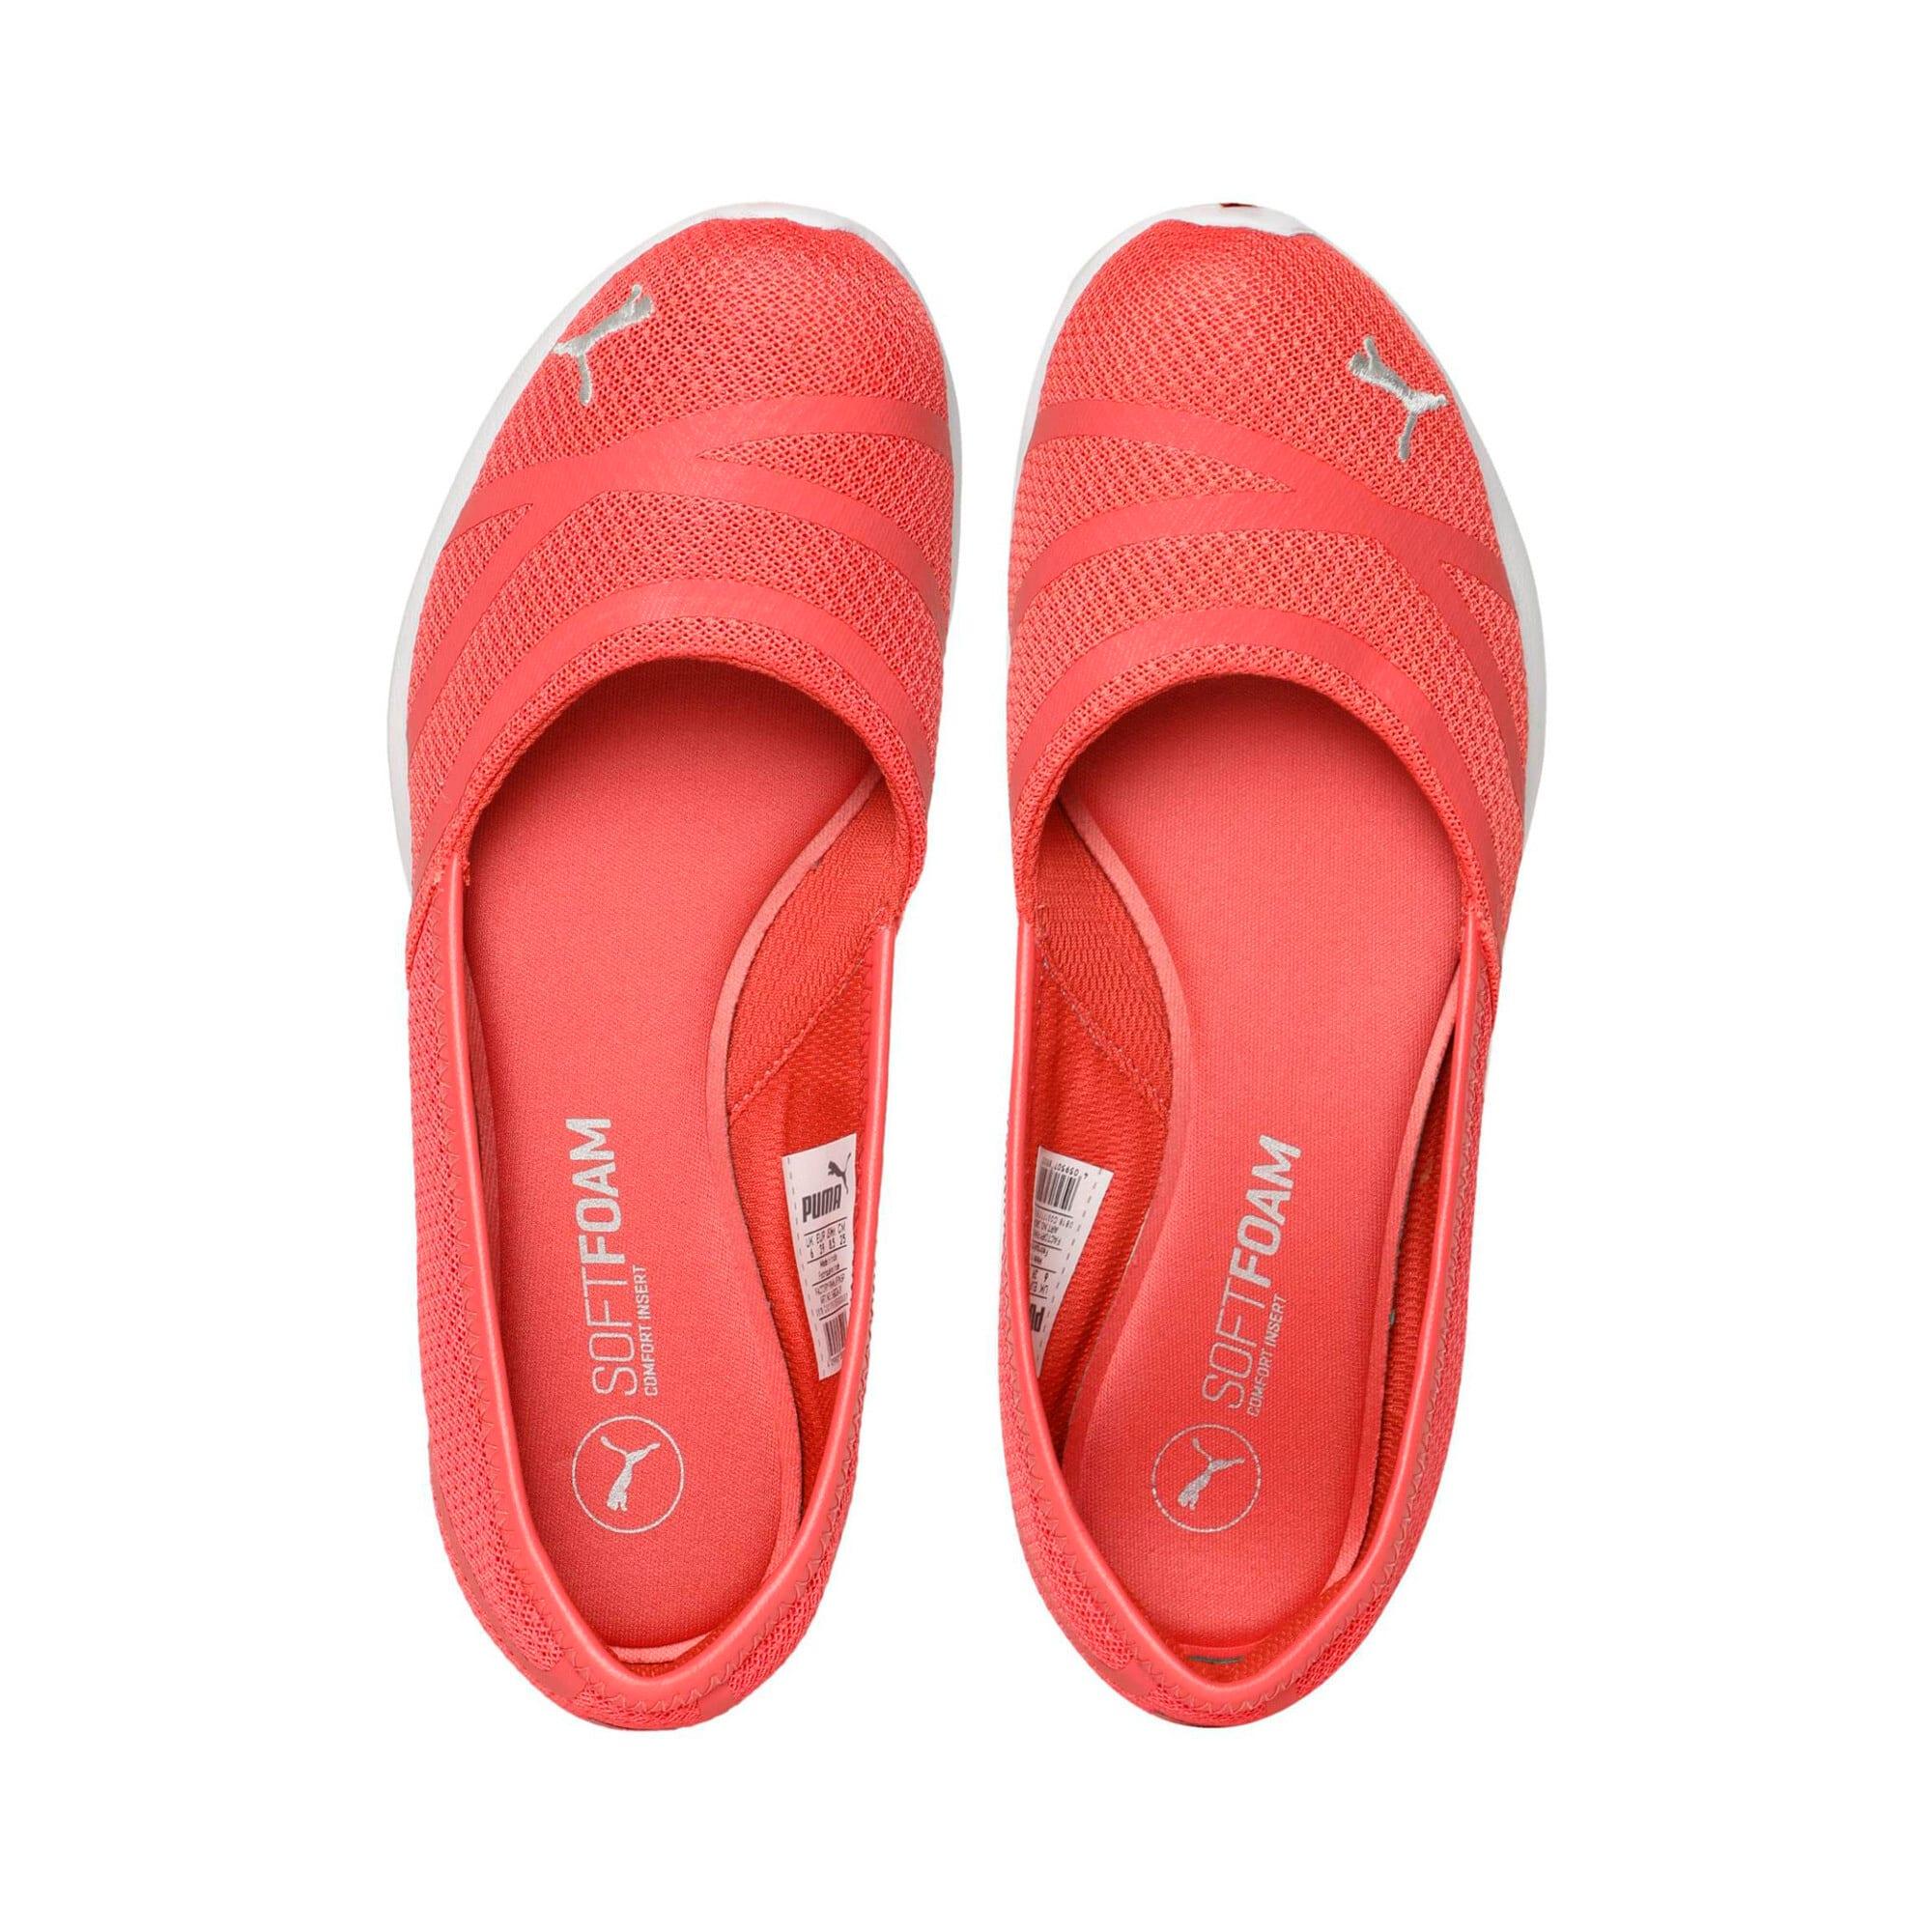 Thumbnail 6 of Escaper SL Jr Running Shoes, Puma Black-Puma White, medium-IND